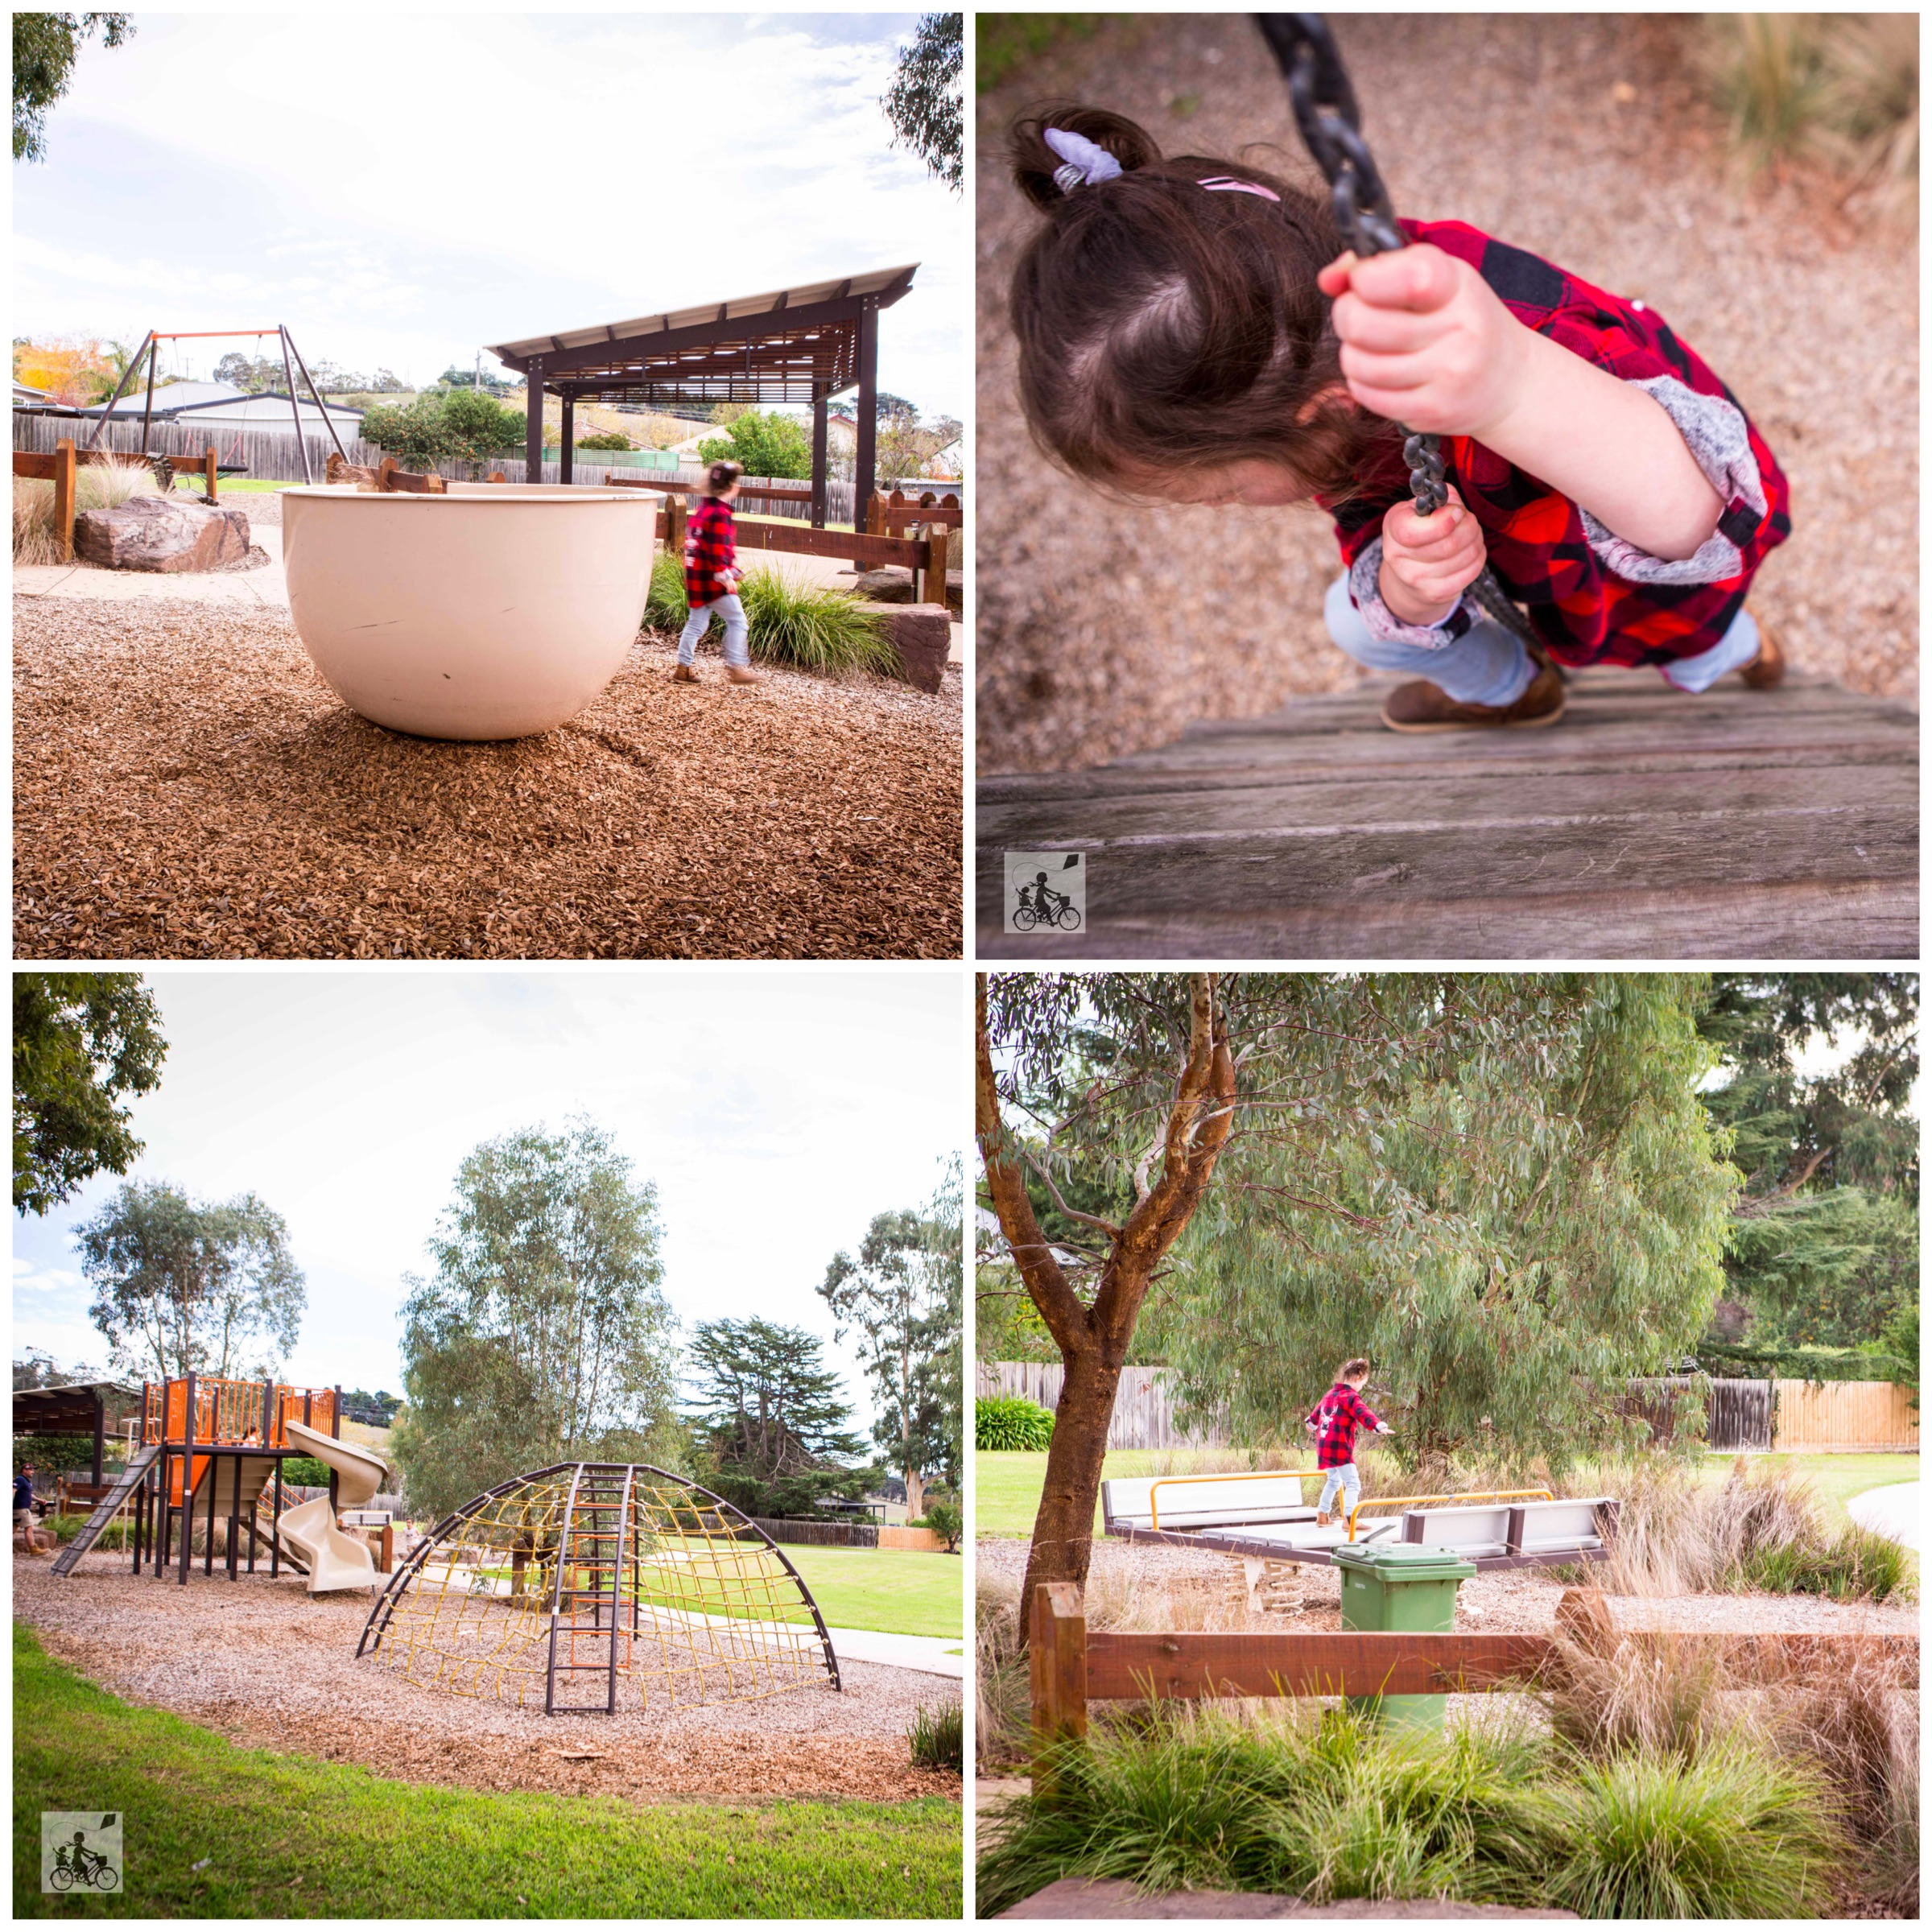 01 Woori Yallock Playground - Mamma Knows East (1 of 15).jpg